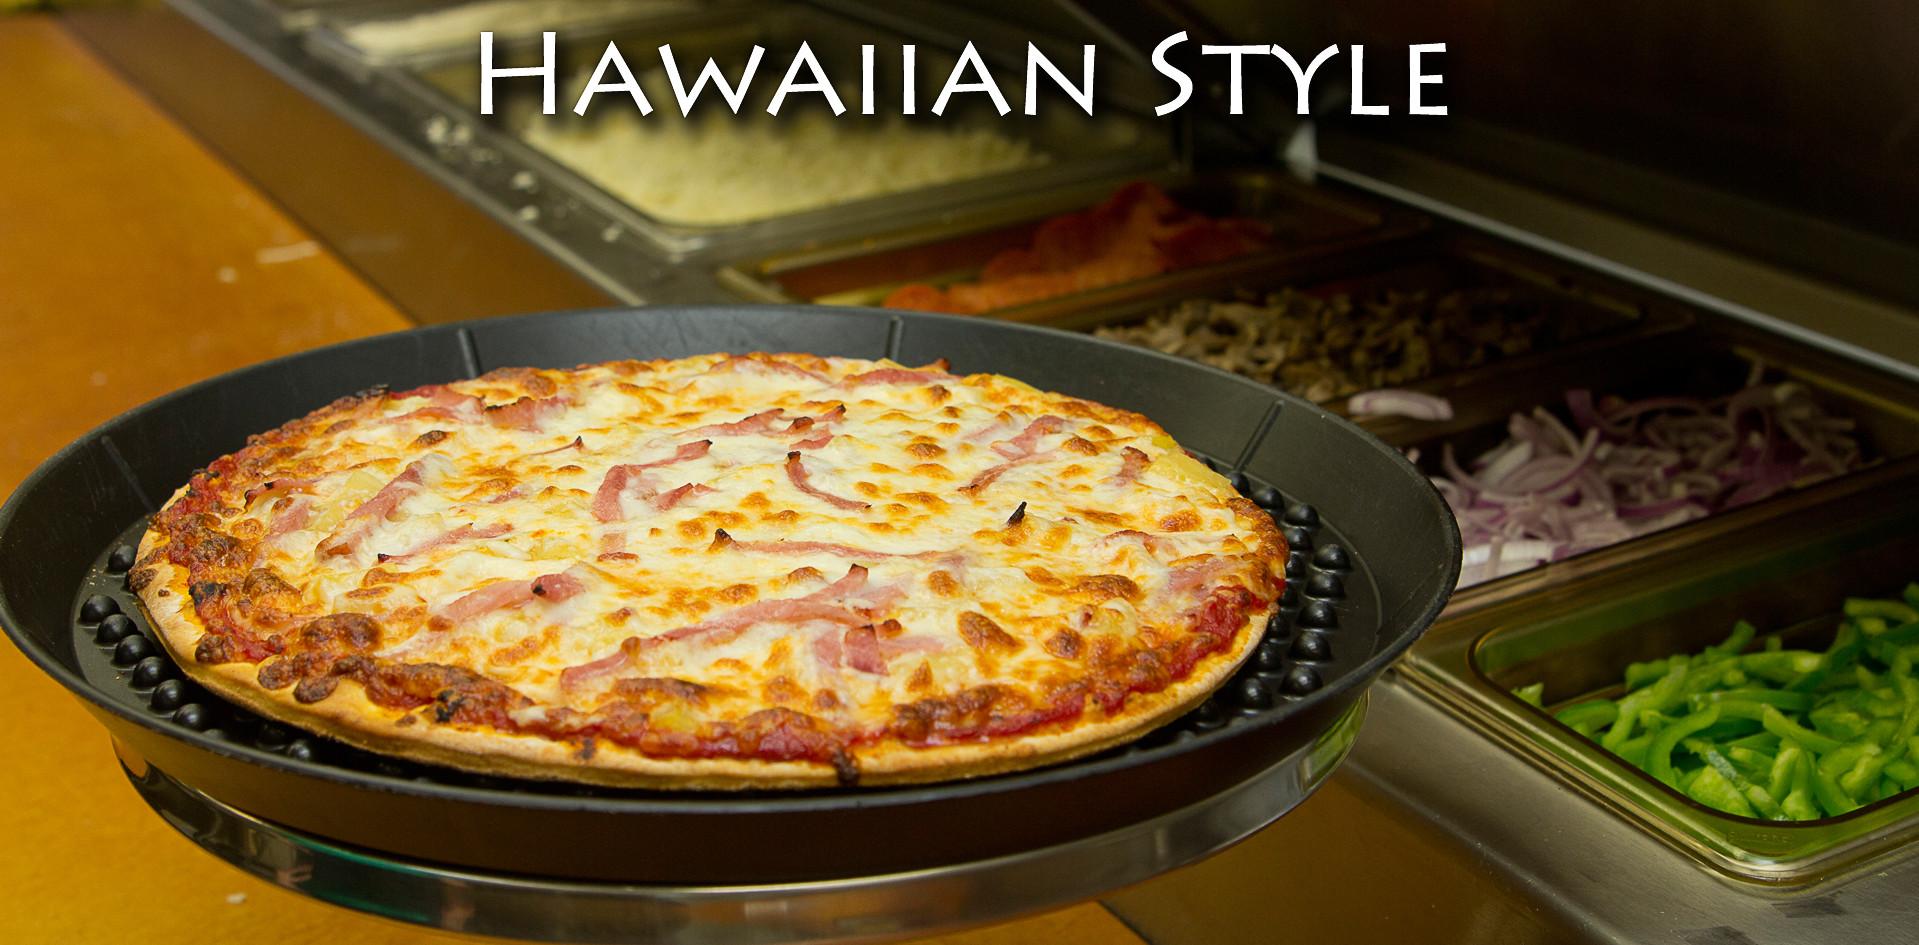 Hawaiian Style Thin Crust Pizza